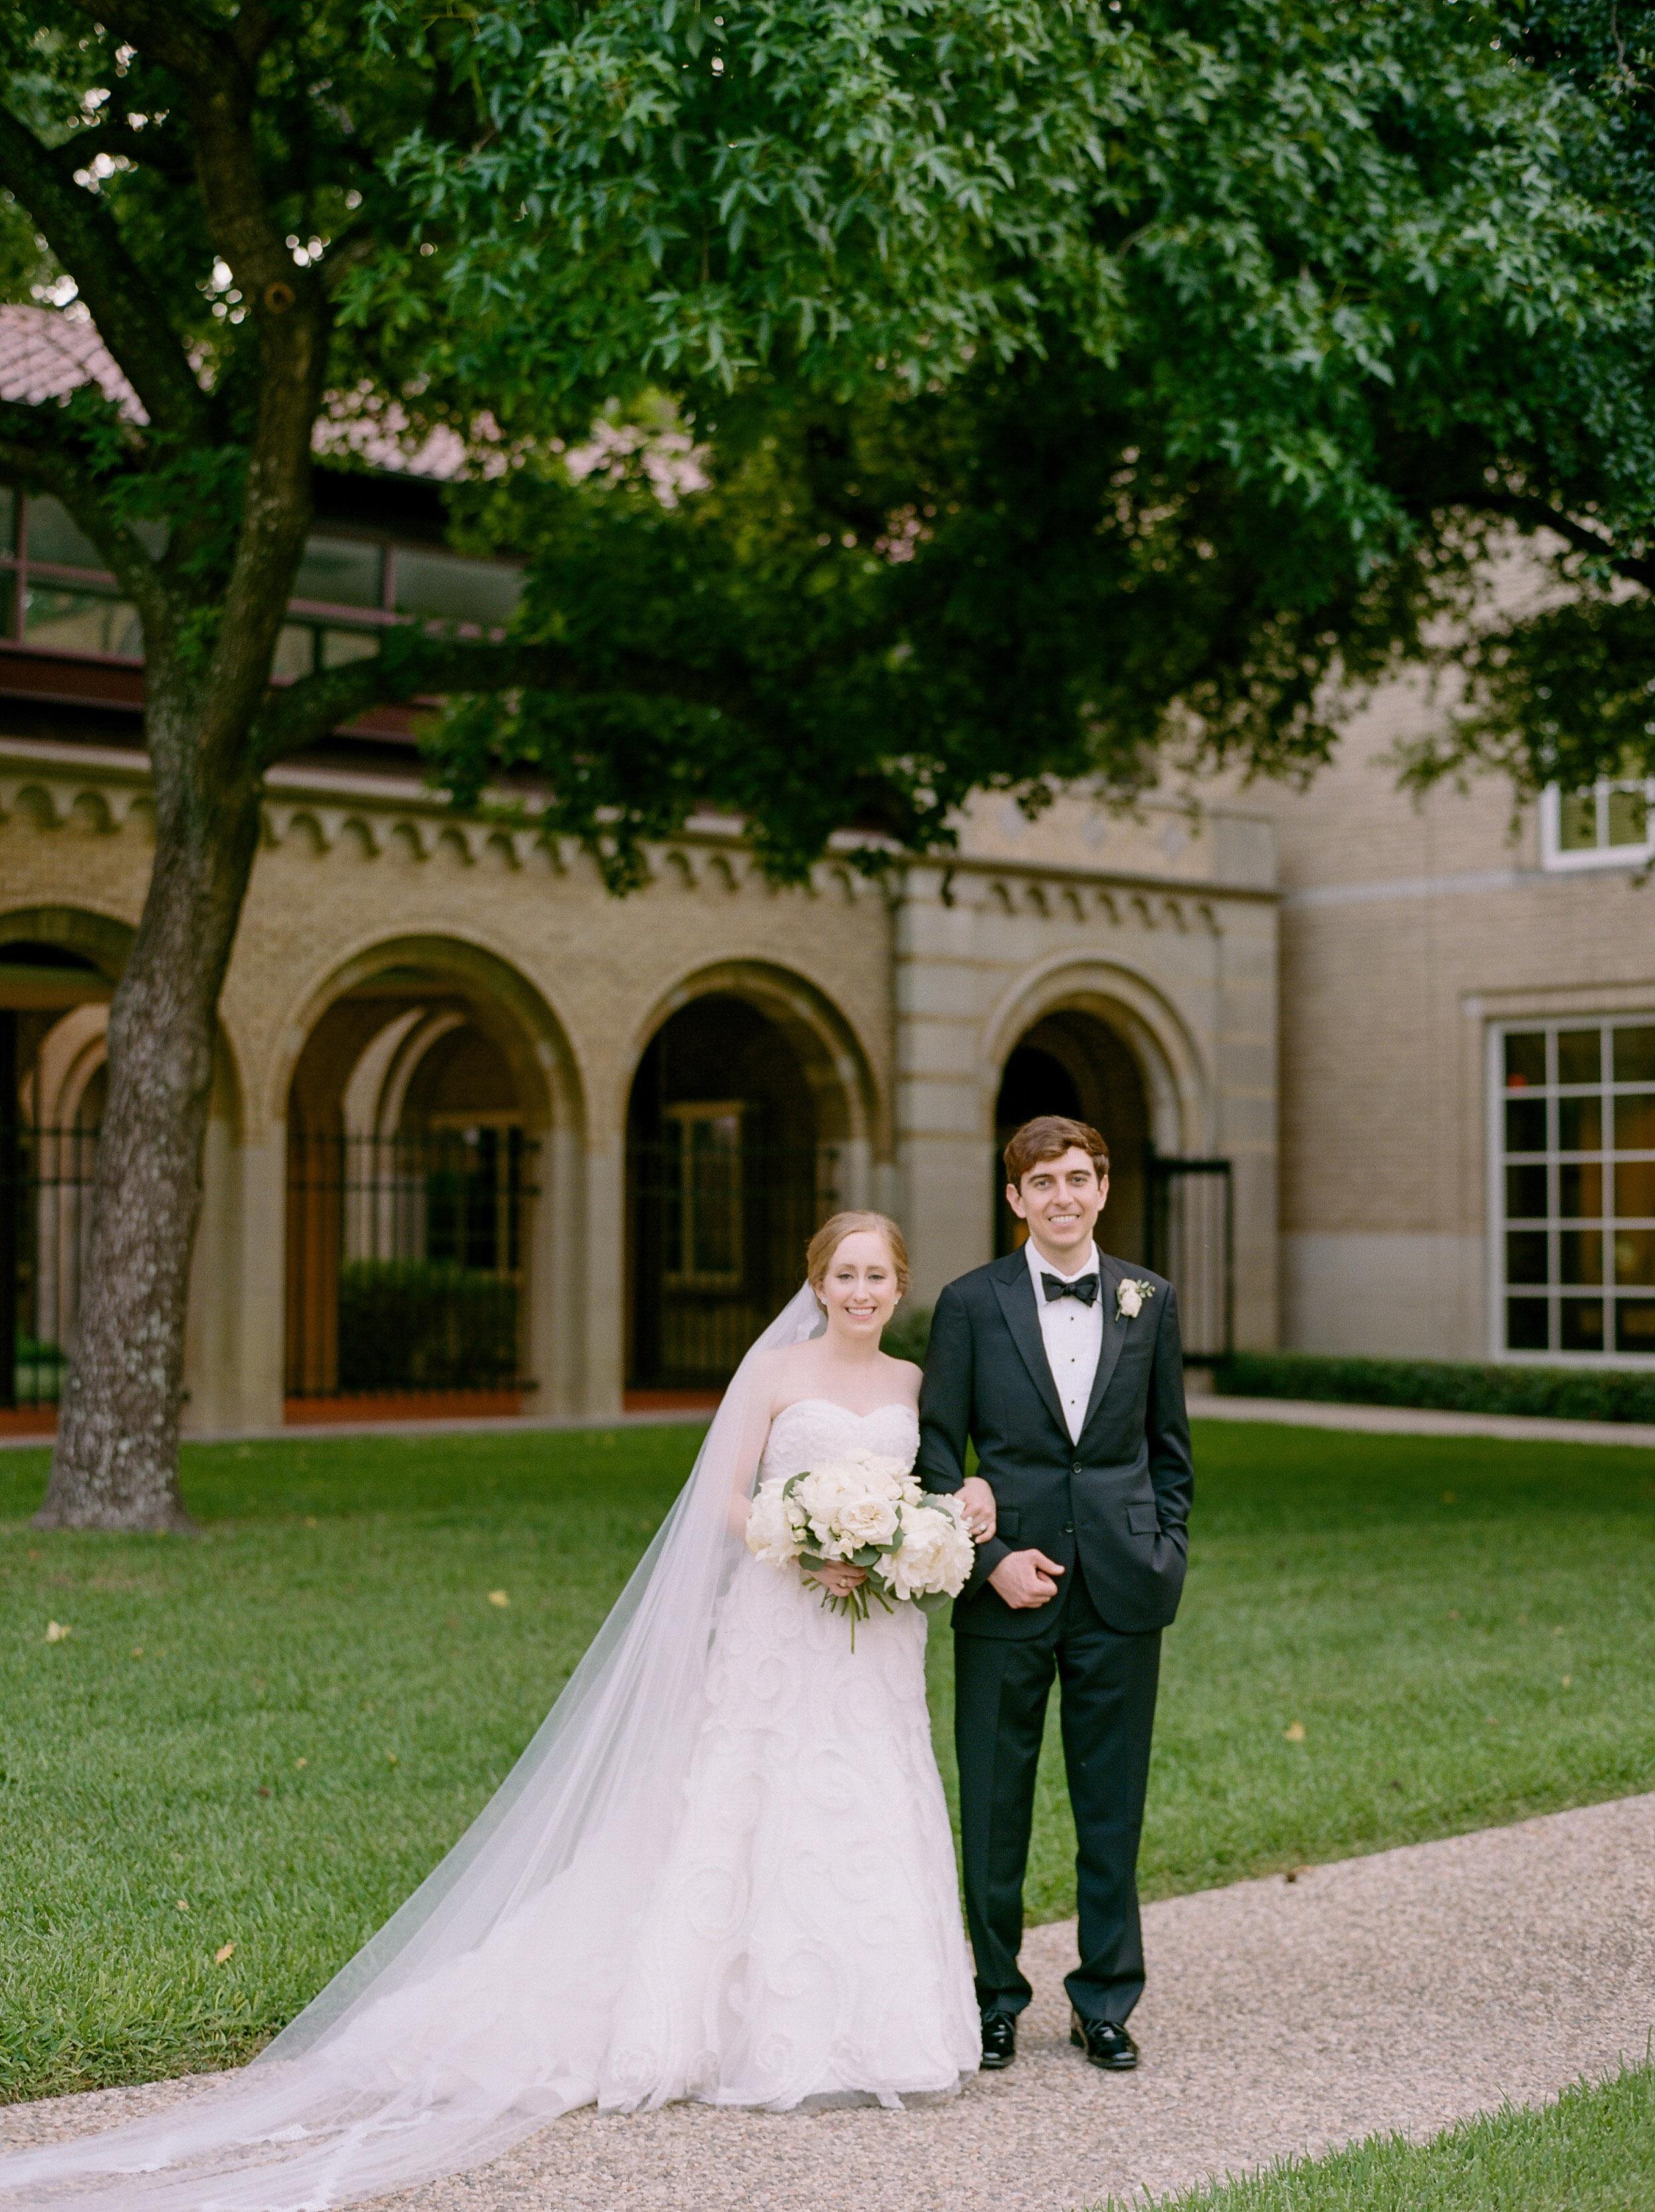 Fine-Art-Film-Houston-Wedding-Photographer-Best-Top-Luxury-Texas-Austin-Dallas-Destination-Dana-Fernandez-Photography-River-Oaks-Country-Club-South-Main-Baptist-Ceremony-Reception-Wedding-31.jpg